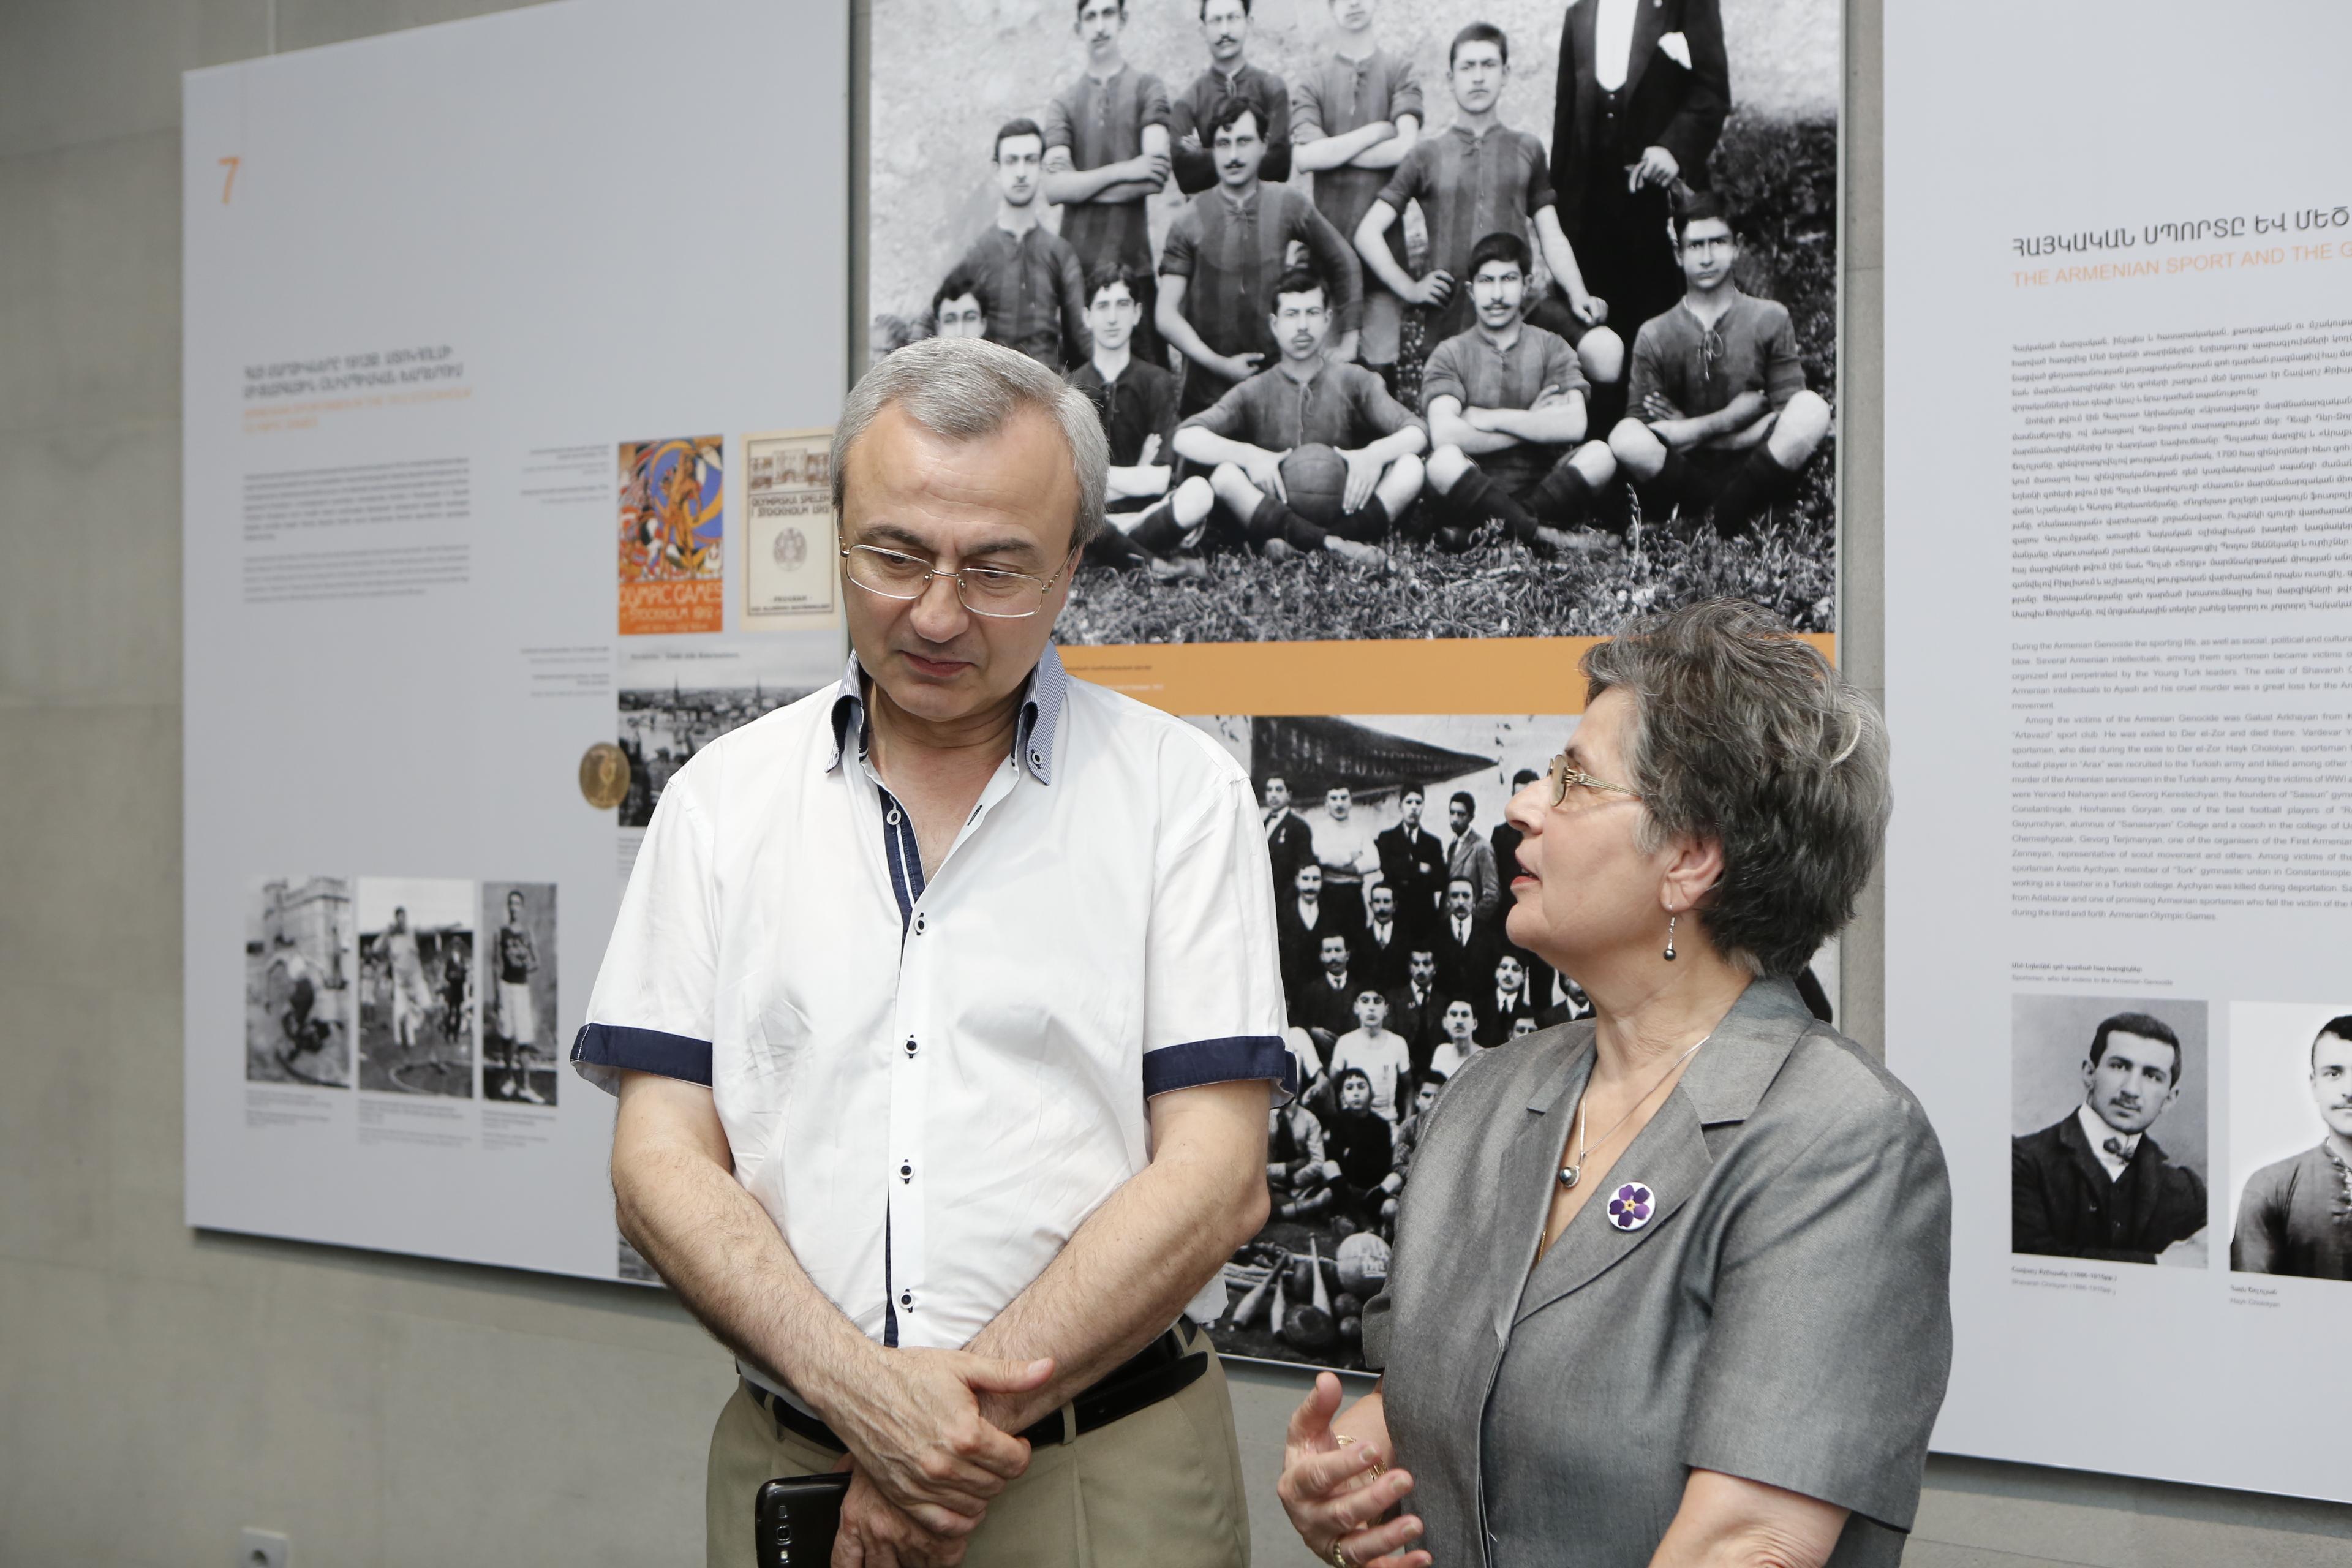 http://www.genocide-museum.am/eng/news-img/04-TE-sport.JPG